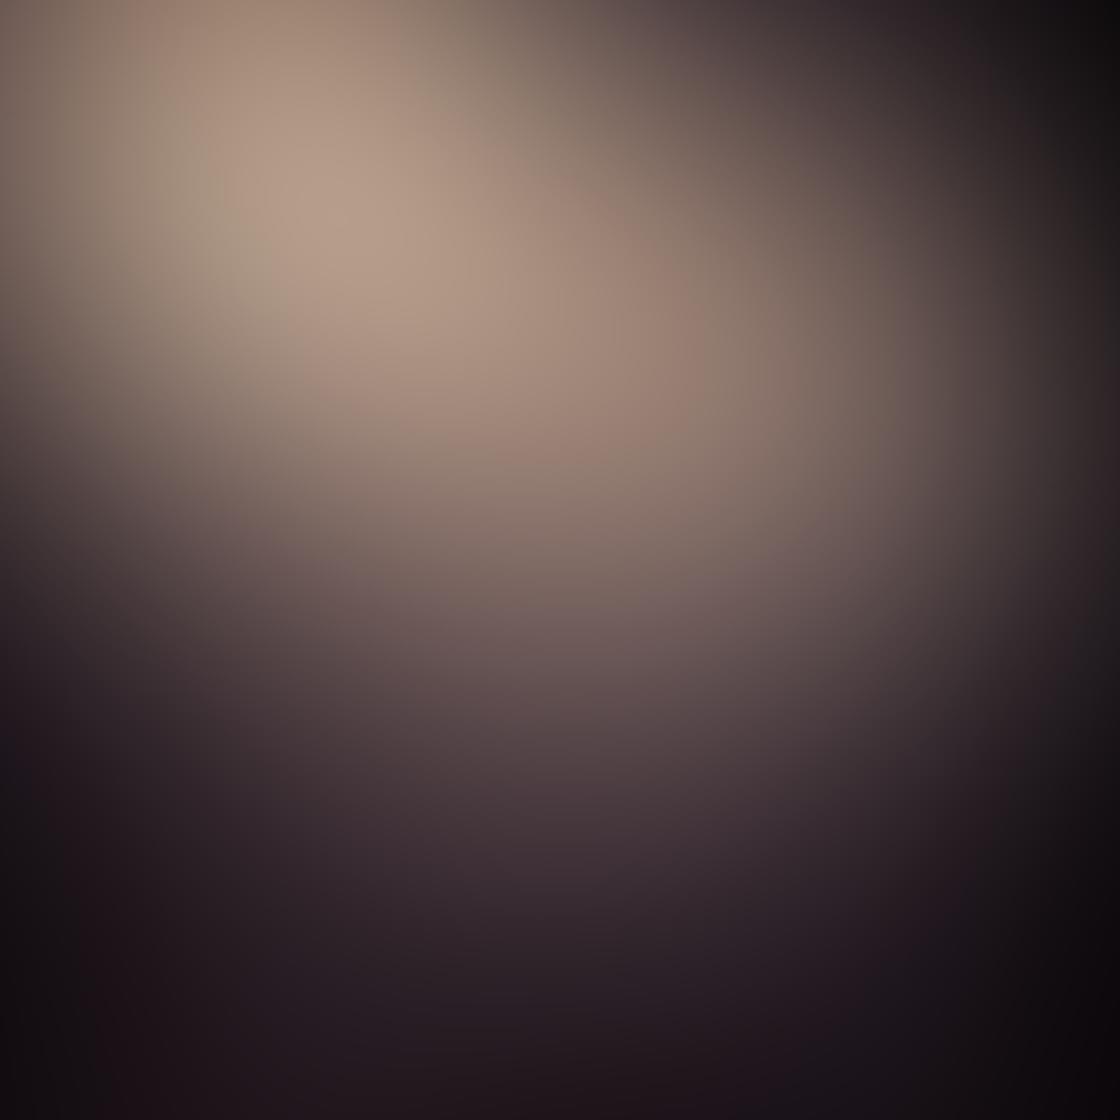 iPhone Sun Photo 02